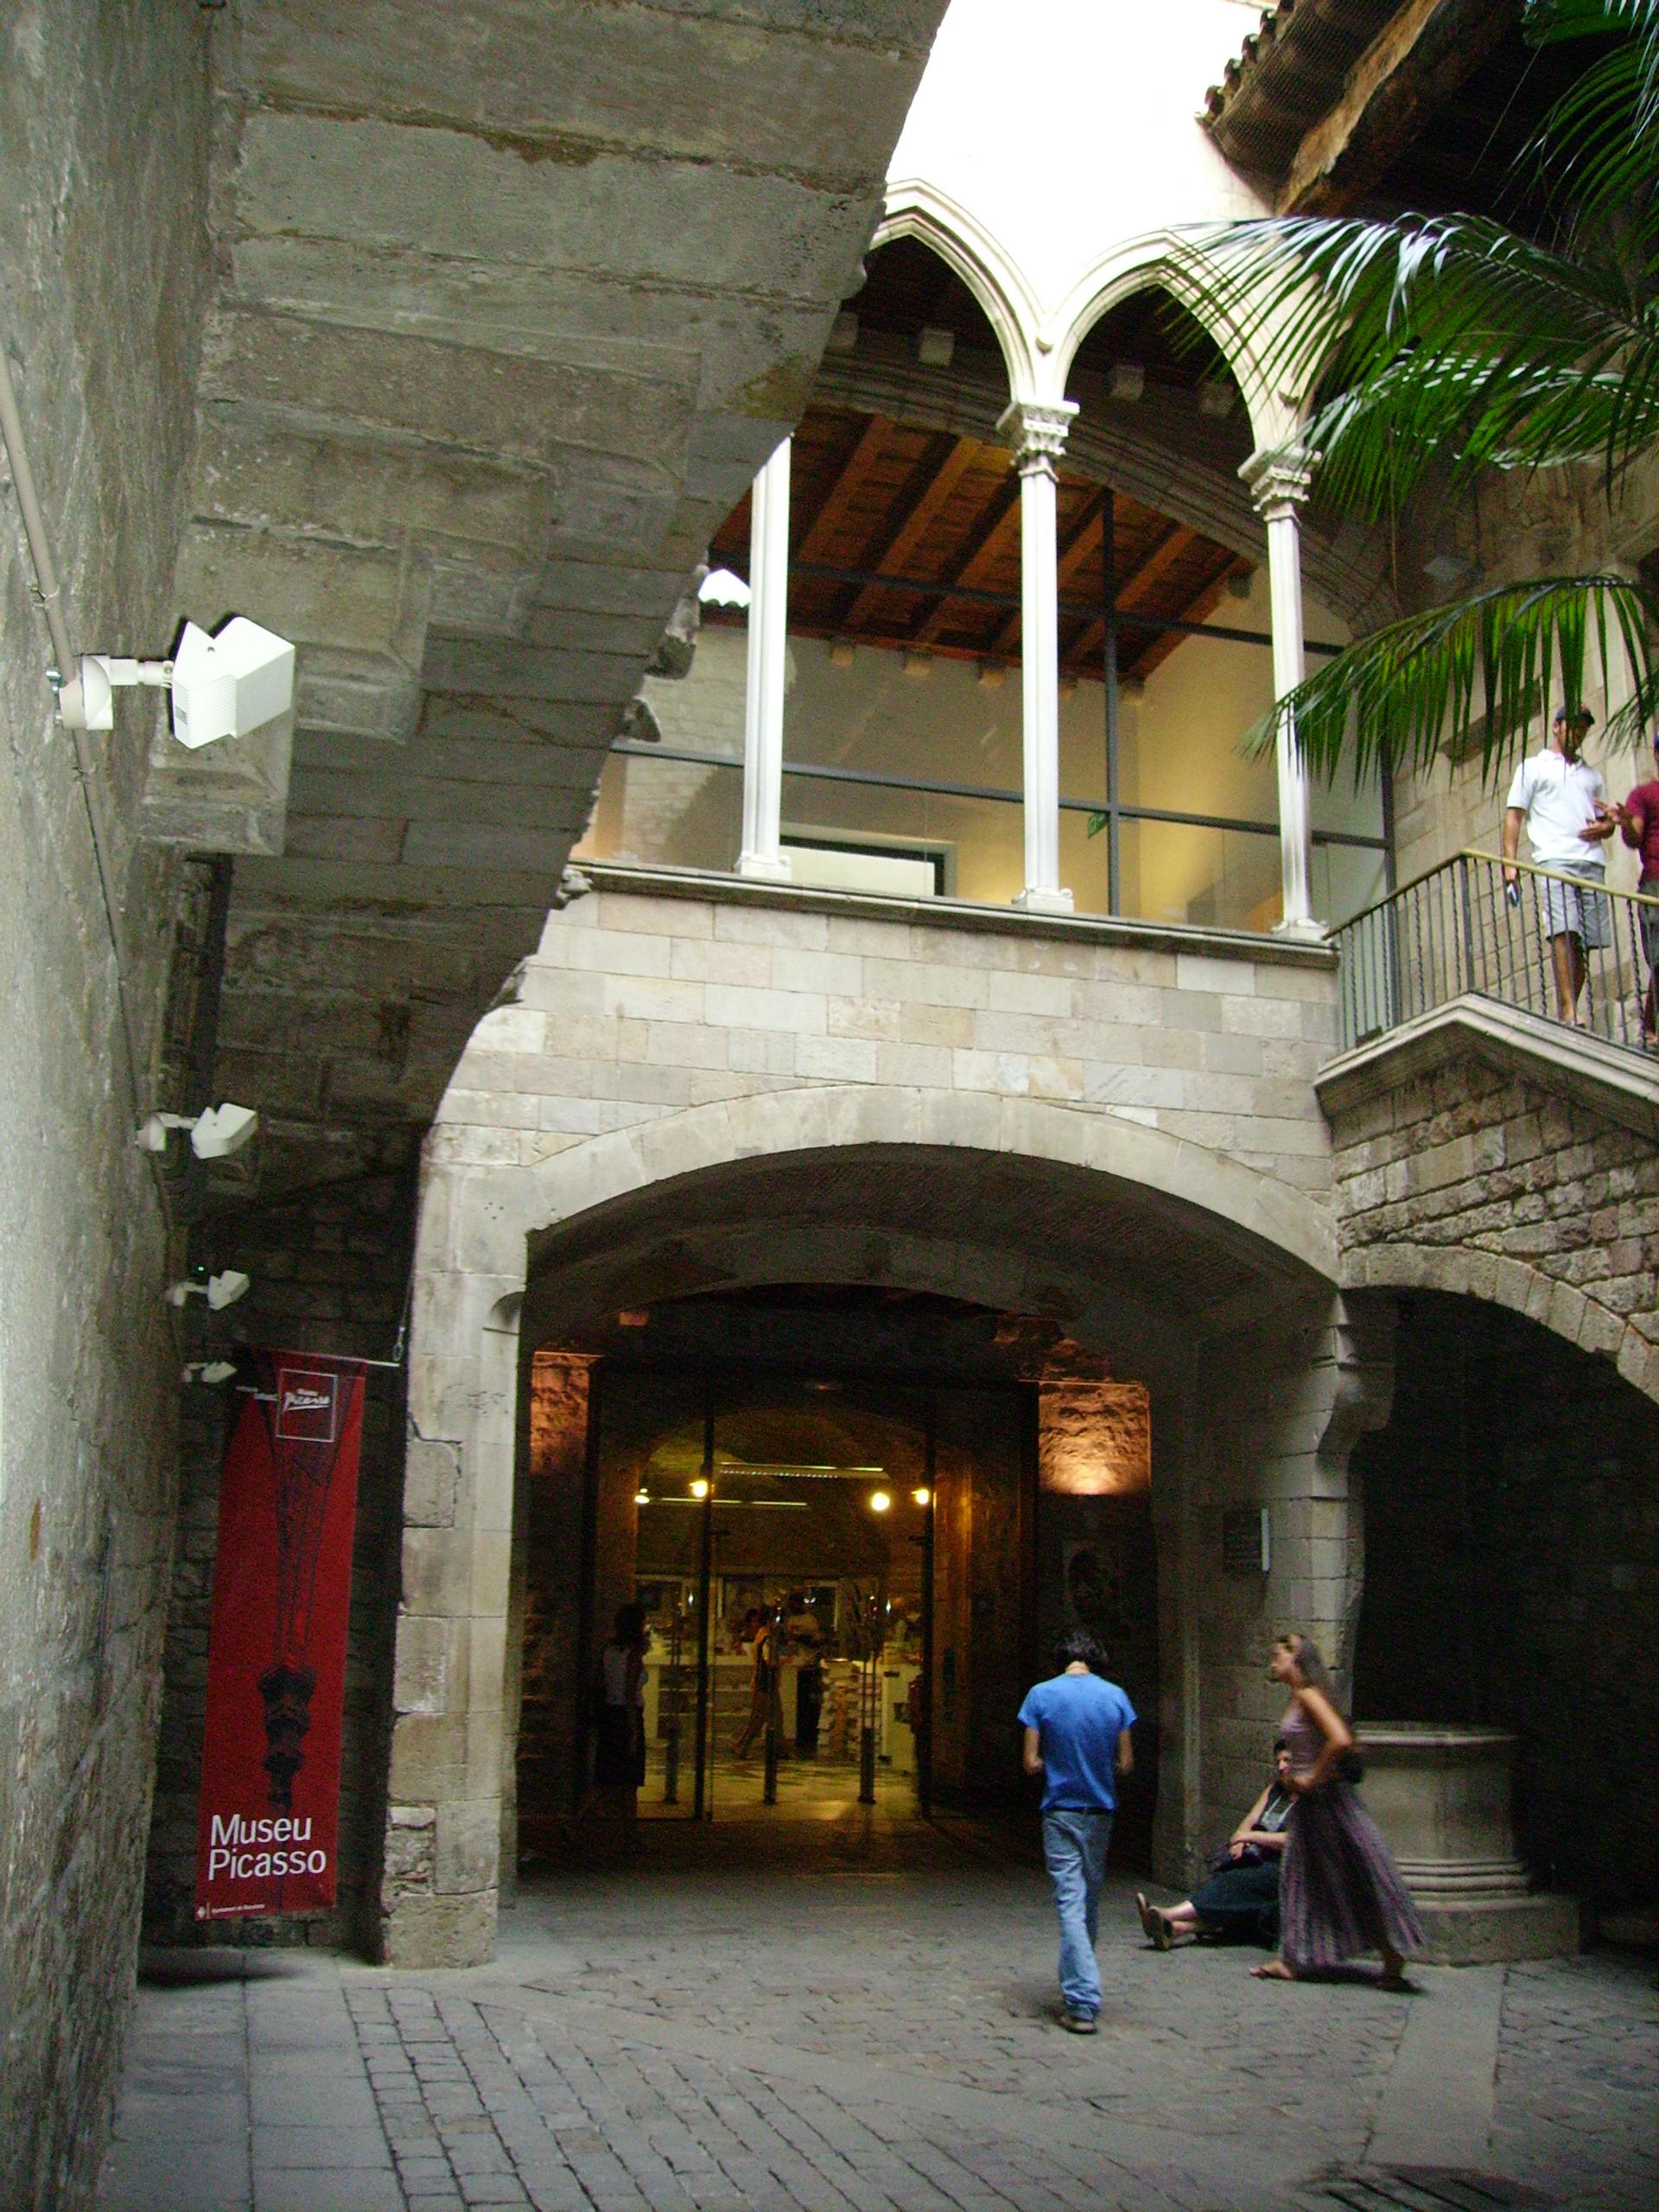 File:Museu Picasso Barcelona.JPG - Wikimedia Commons